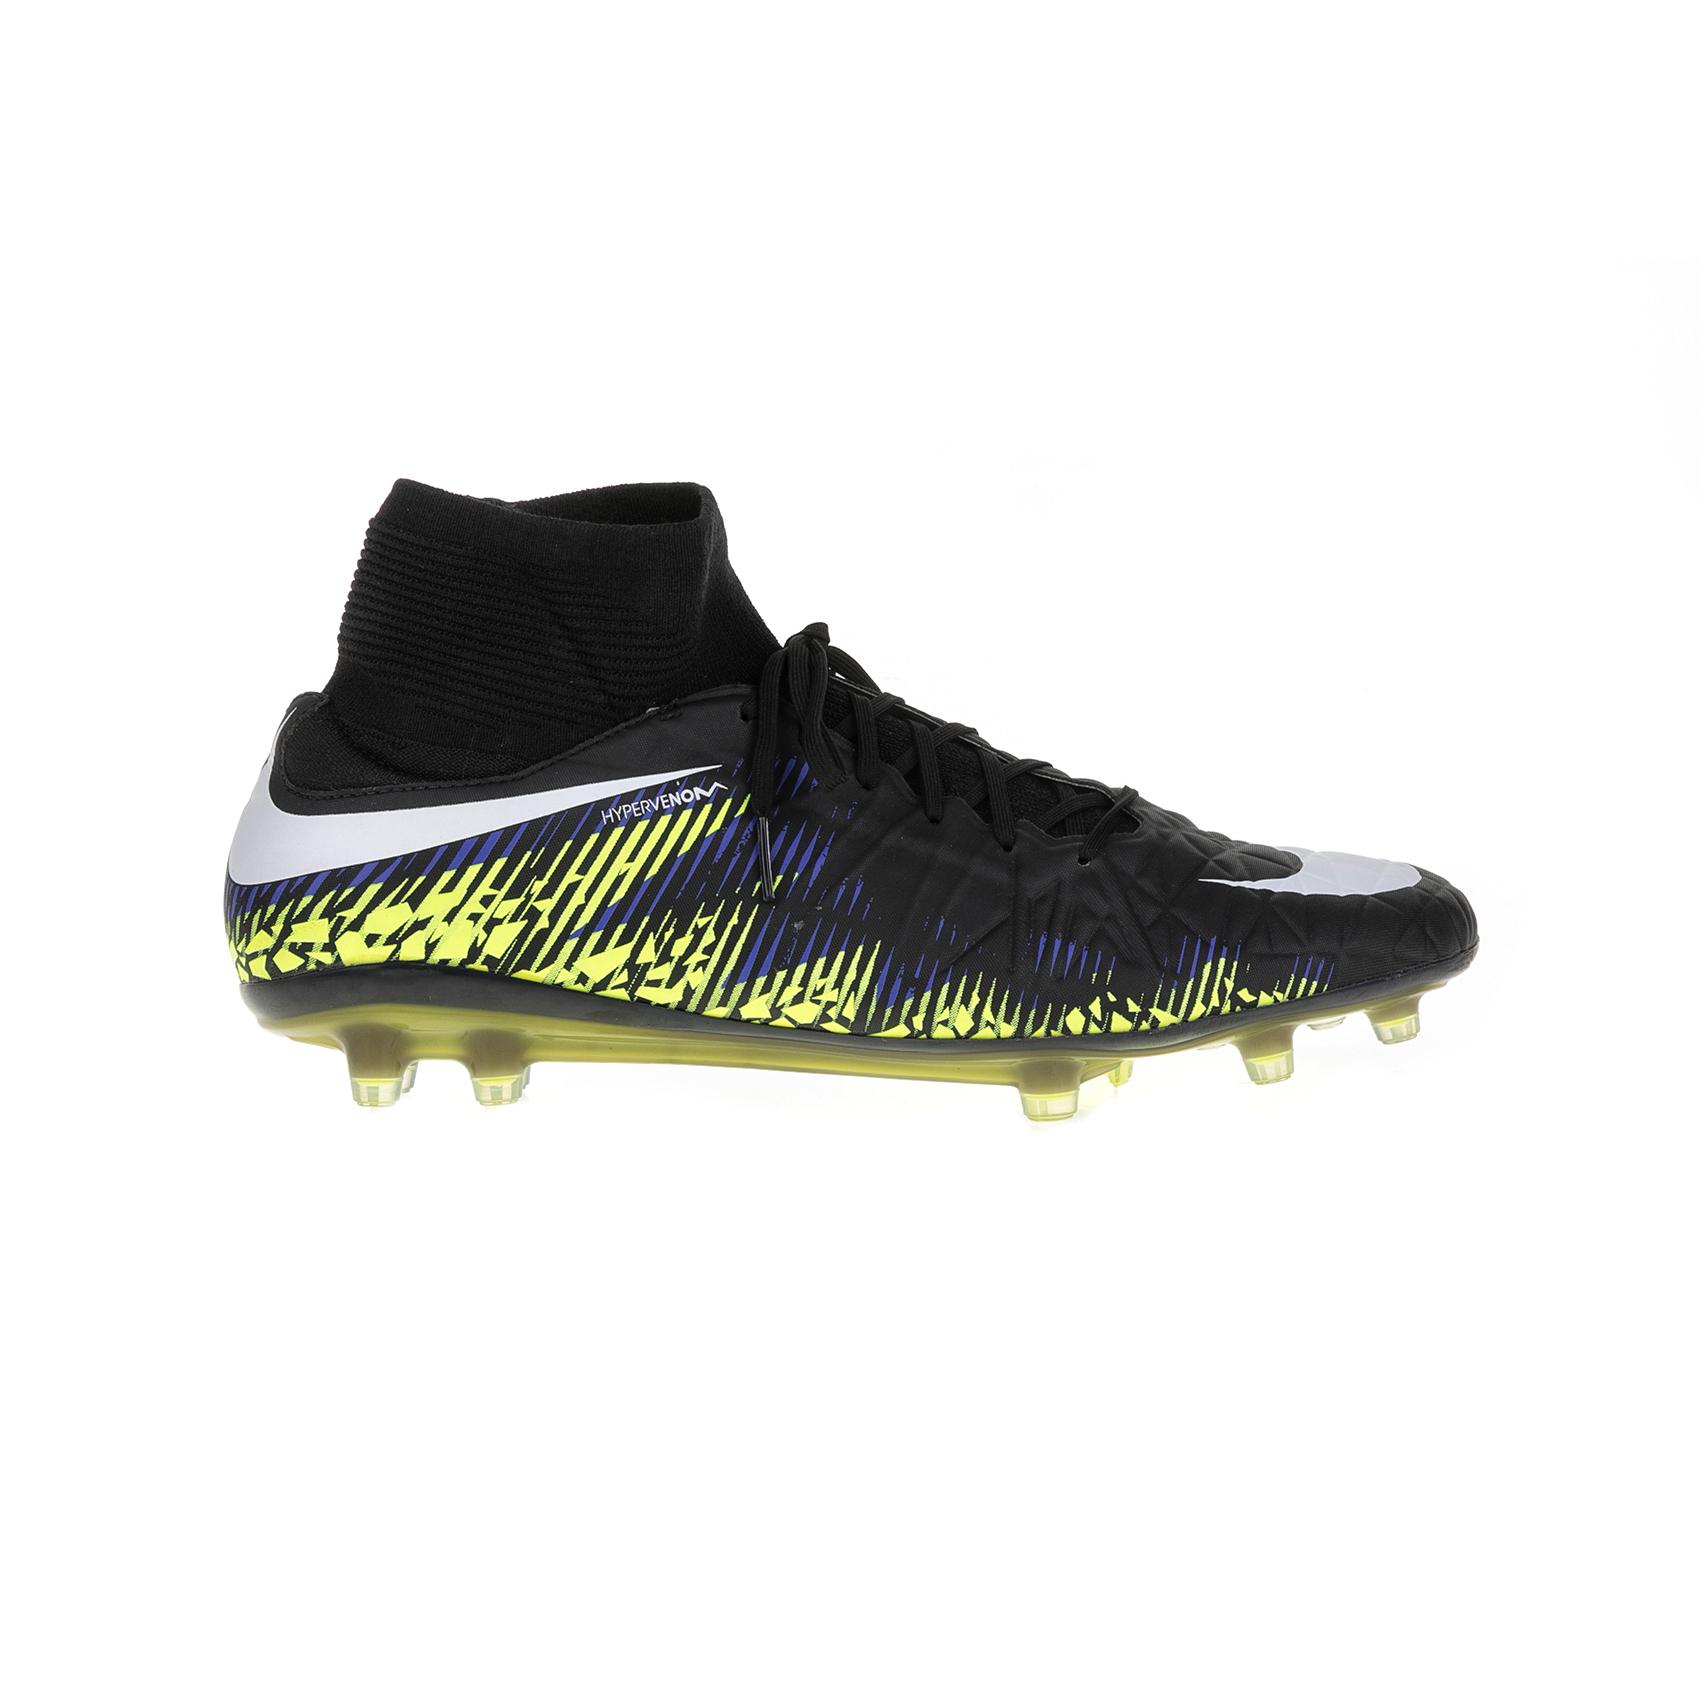 NIKE – Ανδρικά παπούτσια Nike Hypervenom Phatal II DF (FG) μαύρα